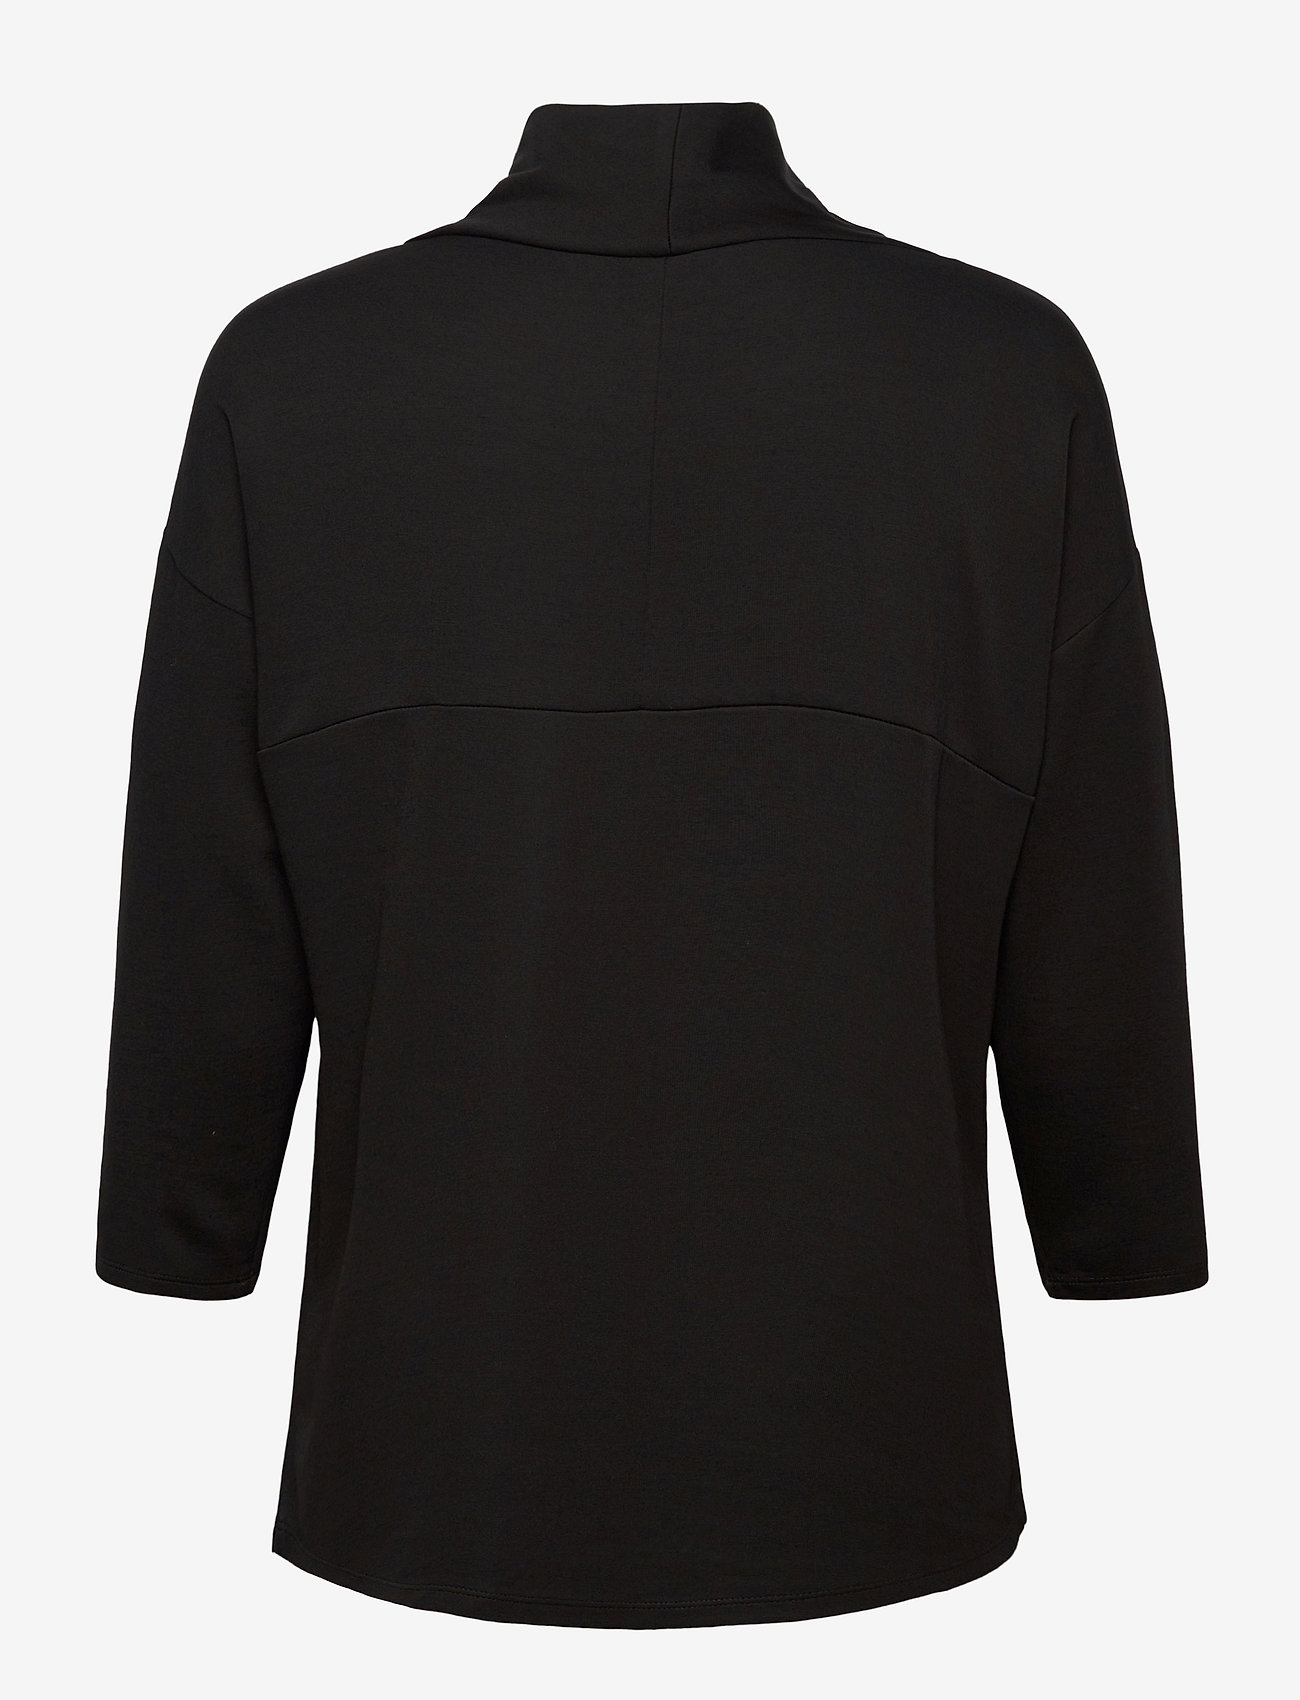 Sweat Short 3/4 Sleeve (Black) (38.99 €) - Betty Barclay fFrTx